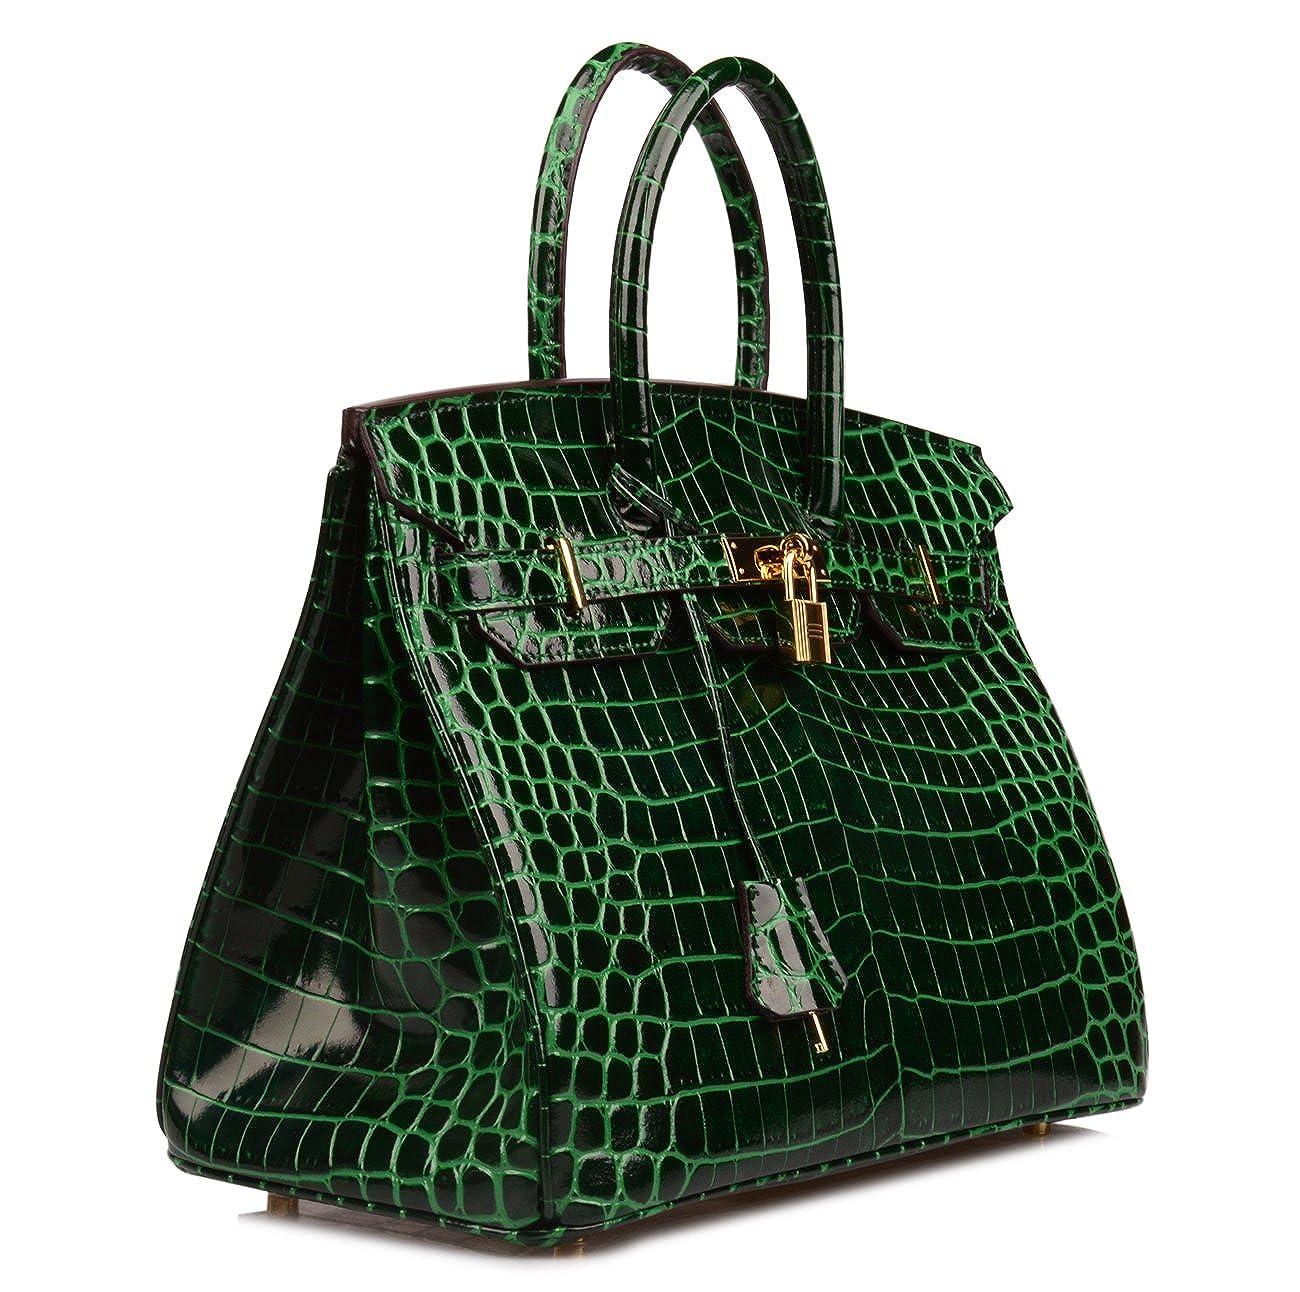 695d977f66 Ainifeel Women s Patent Leather Crocodile Embossed Top Handle Handbags  (30cm